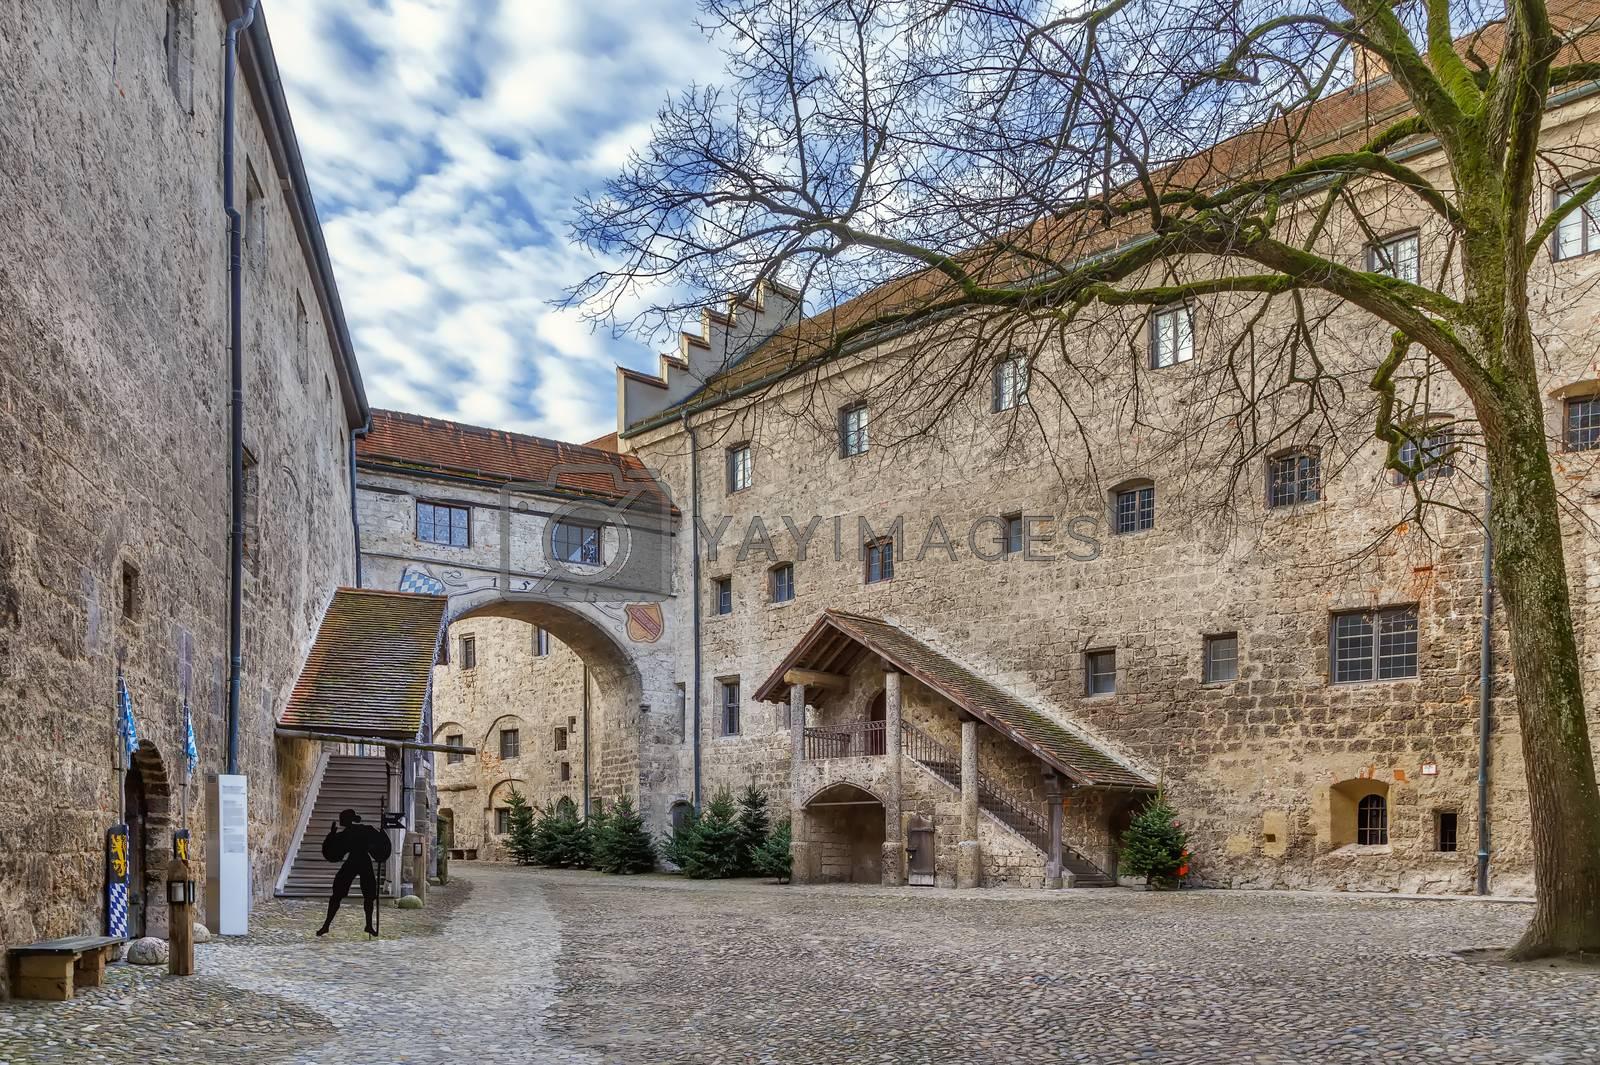 Inner castle courtyard in Burghausen castle, Germany